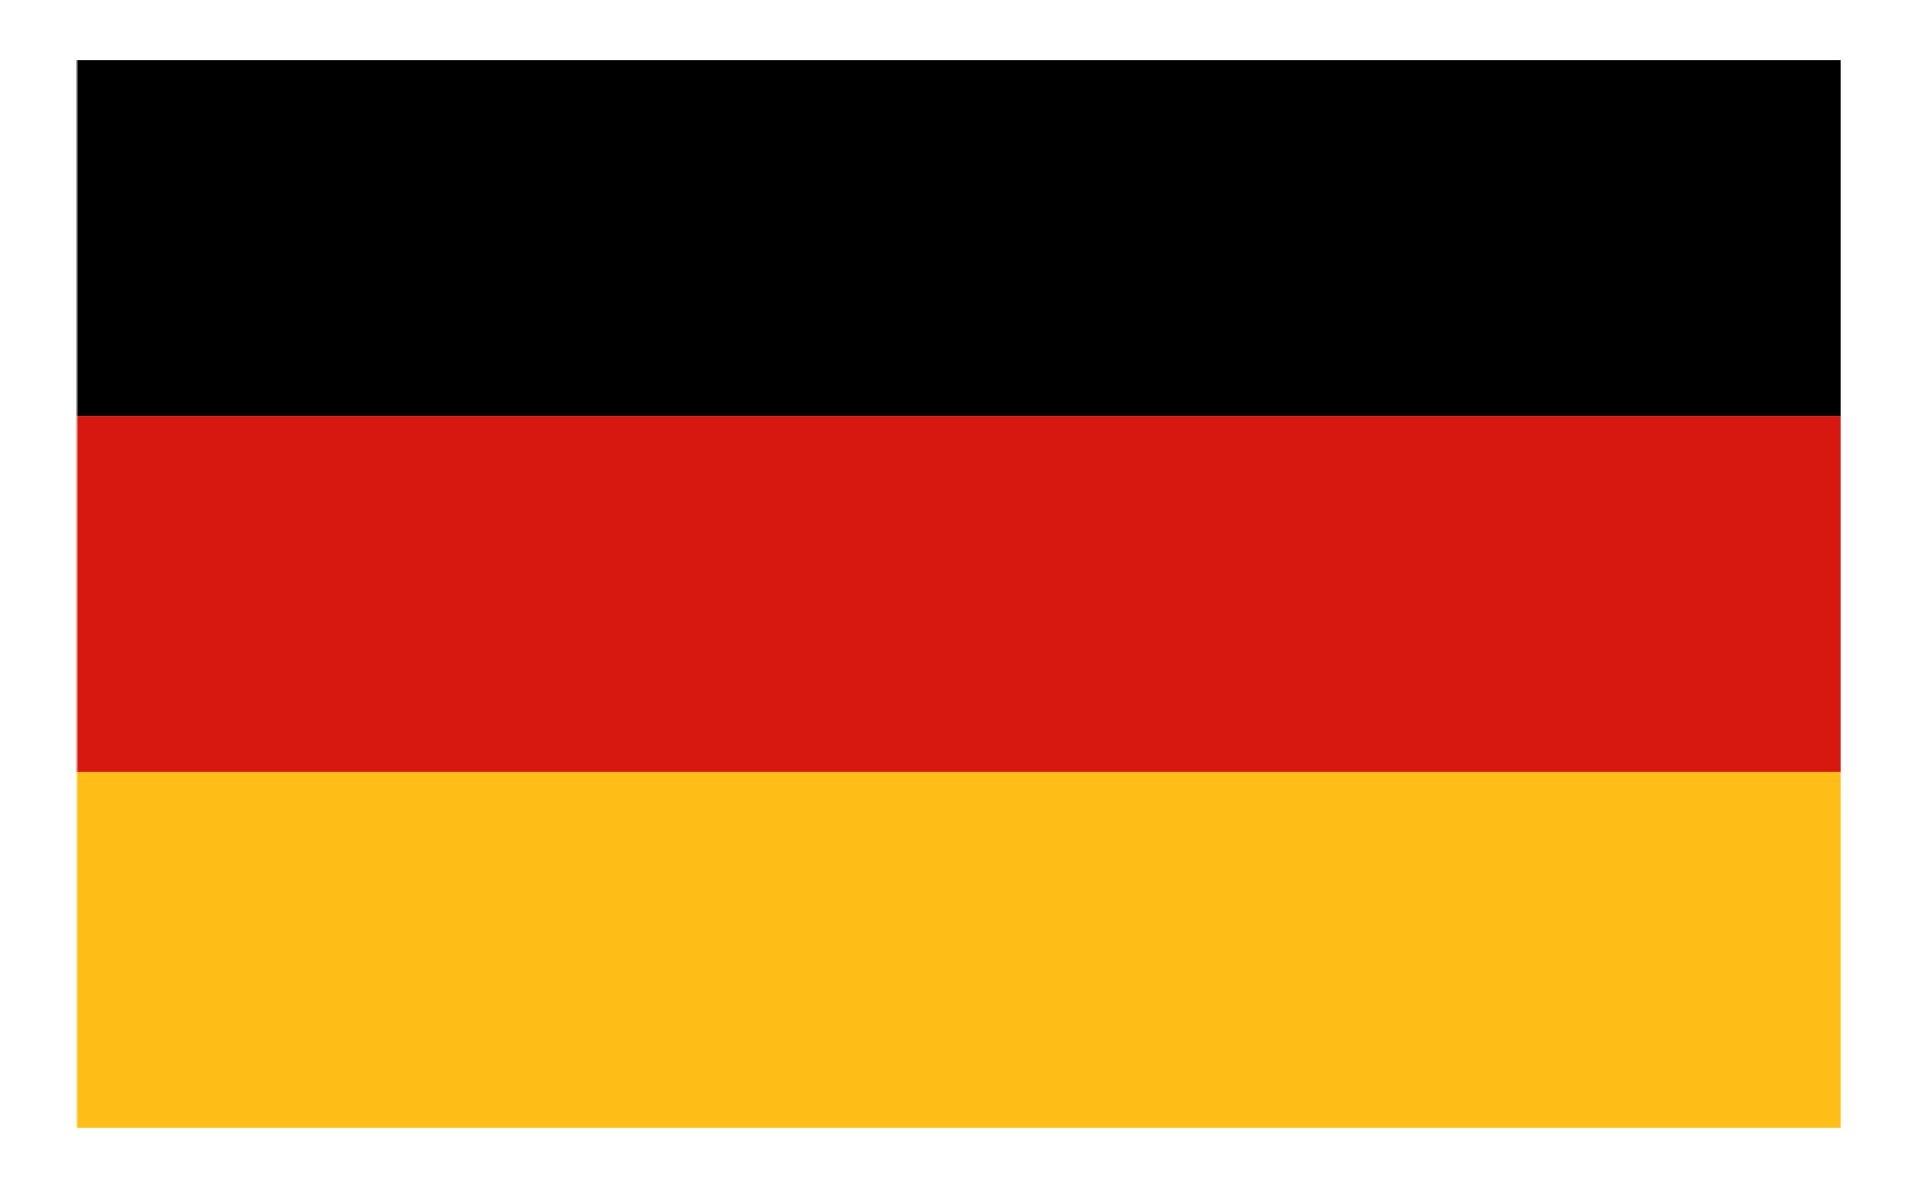 Germany Flag Png - Germany Flag Wallpapers Germany Flag Art Desktop Wallpaper 查看 ., Transparent background PNG HD thumbnail